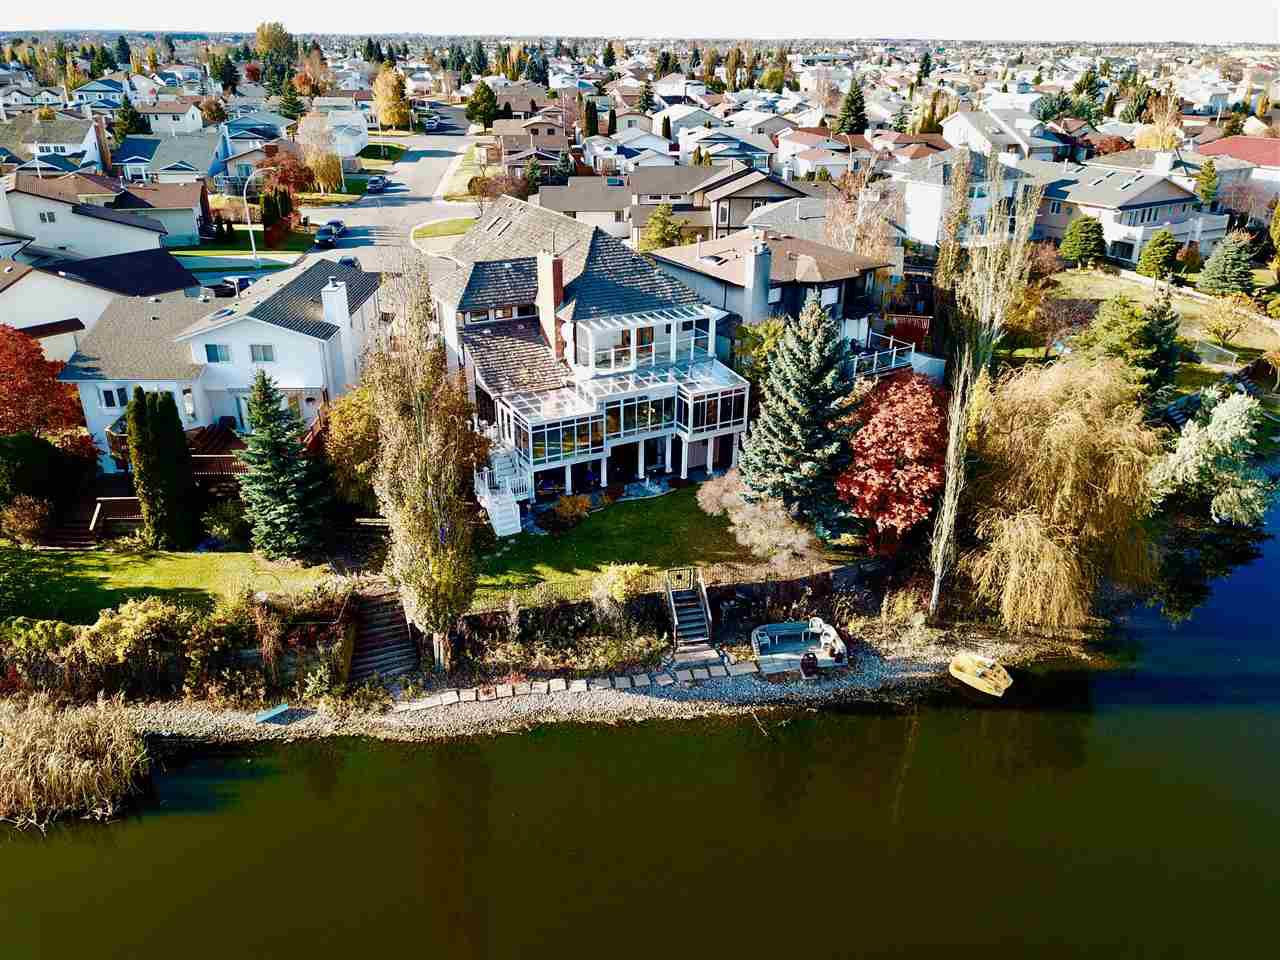 Main Photo: 7604 157 Avenue in Edmonton: Zone 28 House for sale : MLS®# E4182557